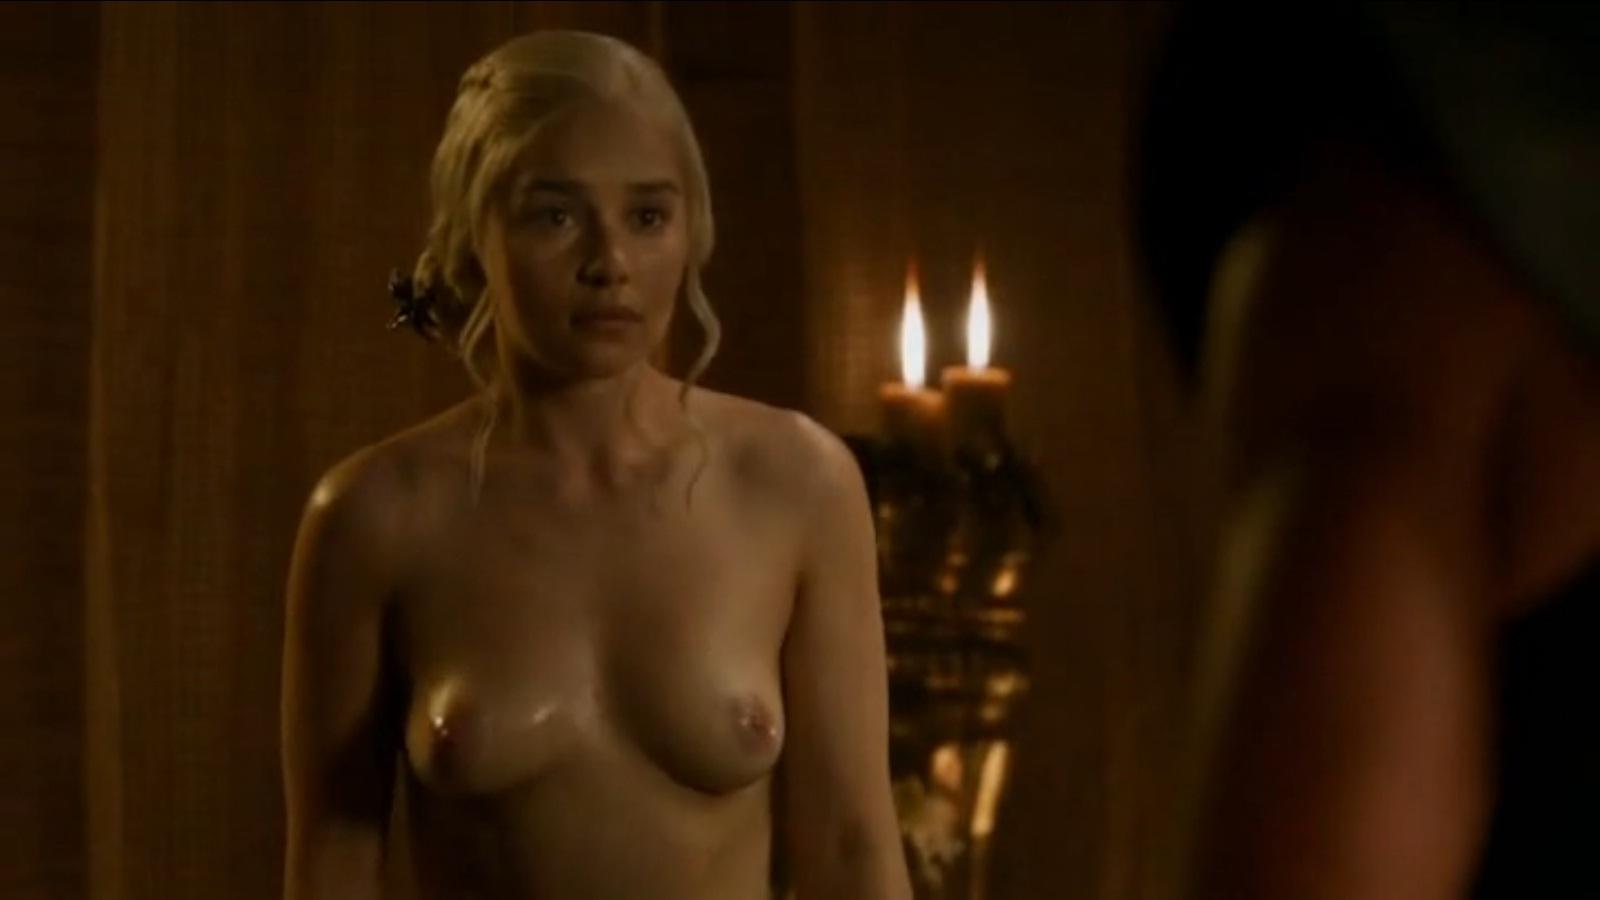 Game Of Thrones Un Soft Porno Olduğu Gerçeği 491678 Uludağ Sözlük